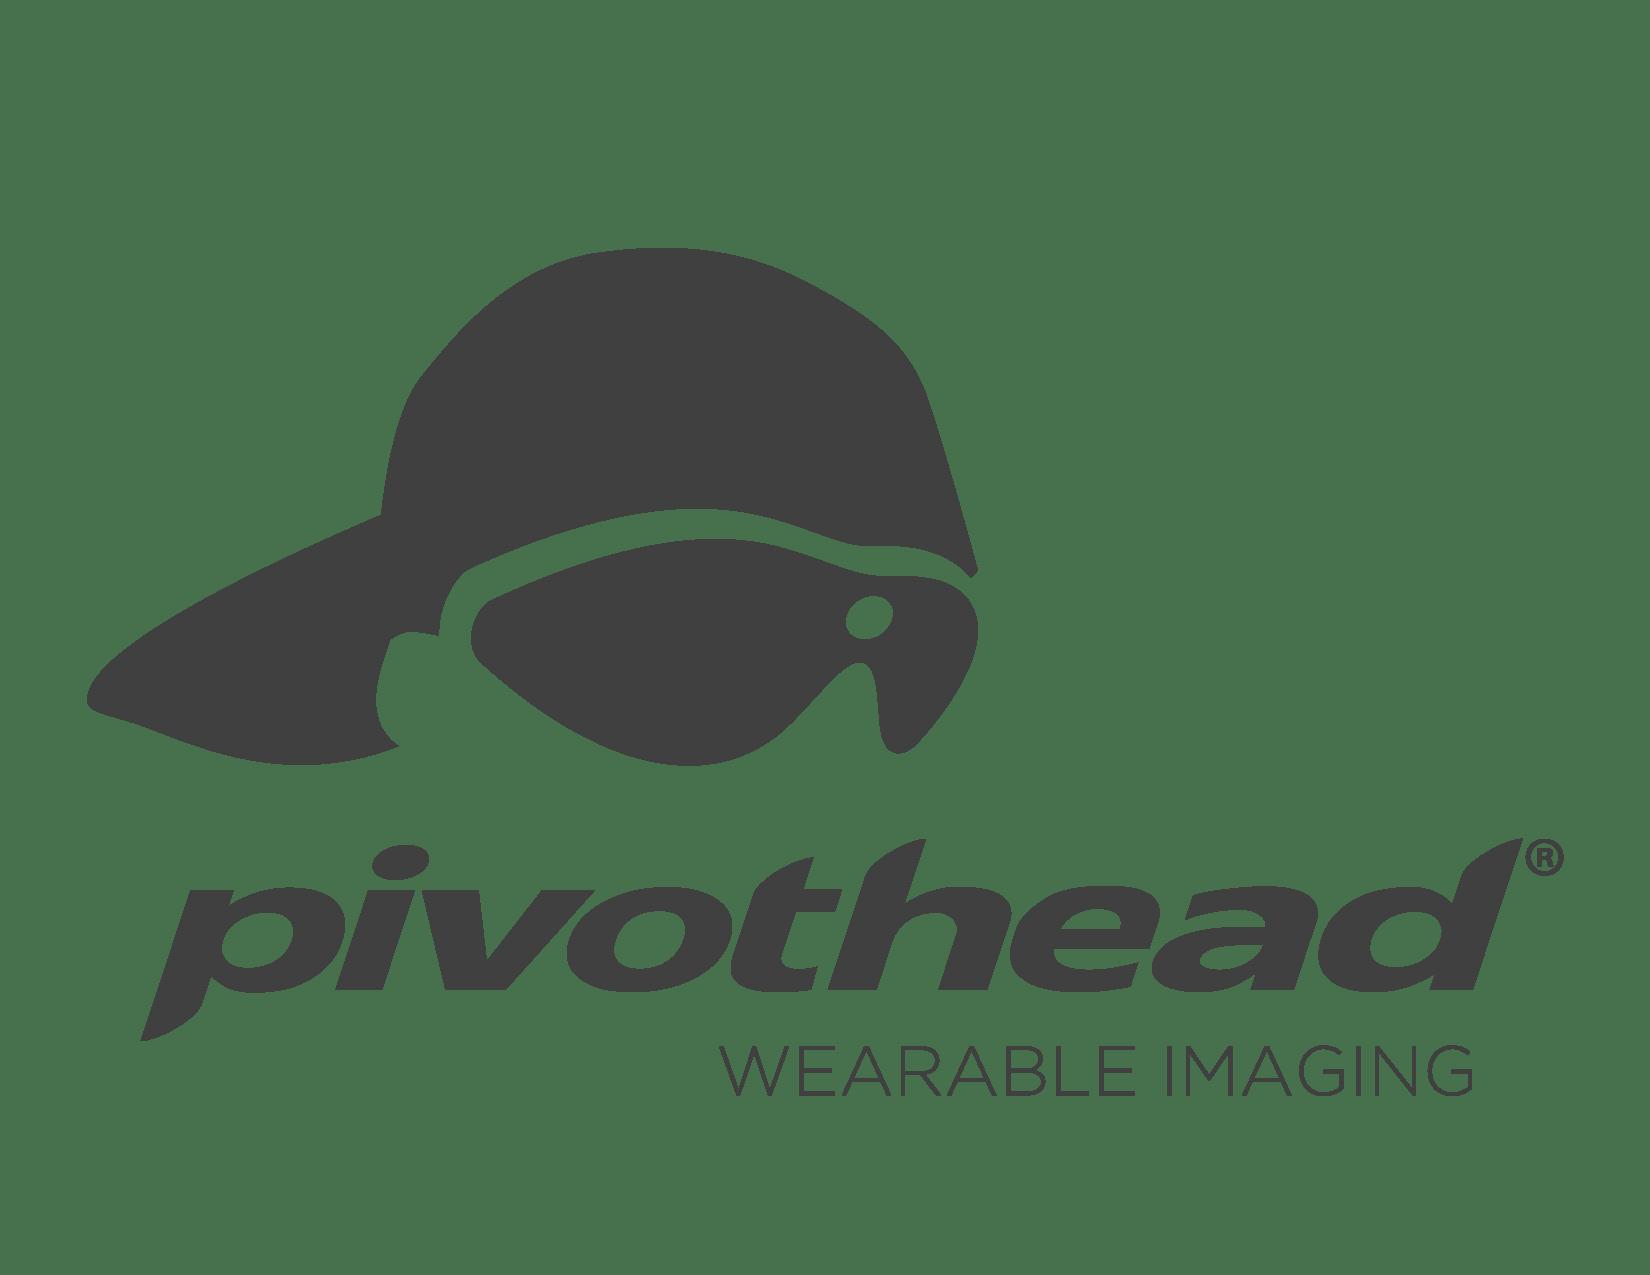 pivothead launches indiegogo campaign to bring smart